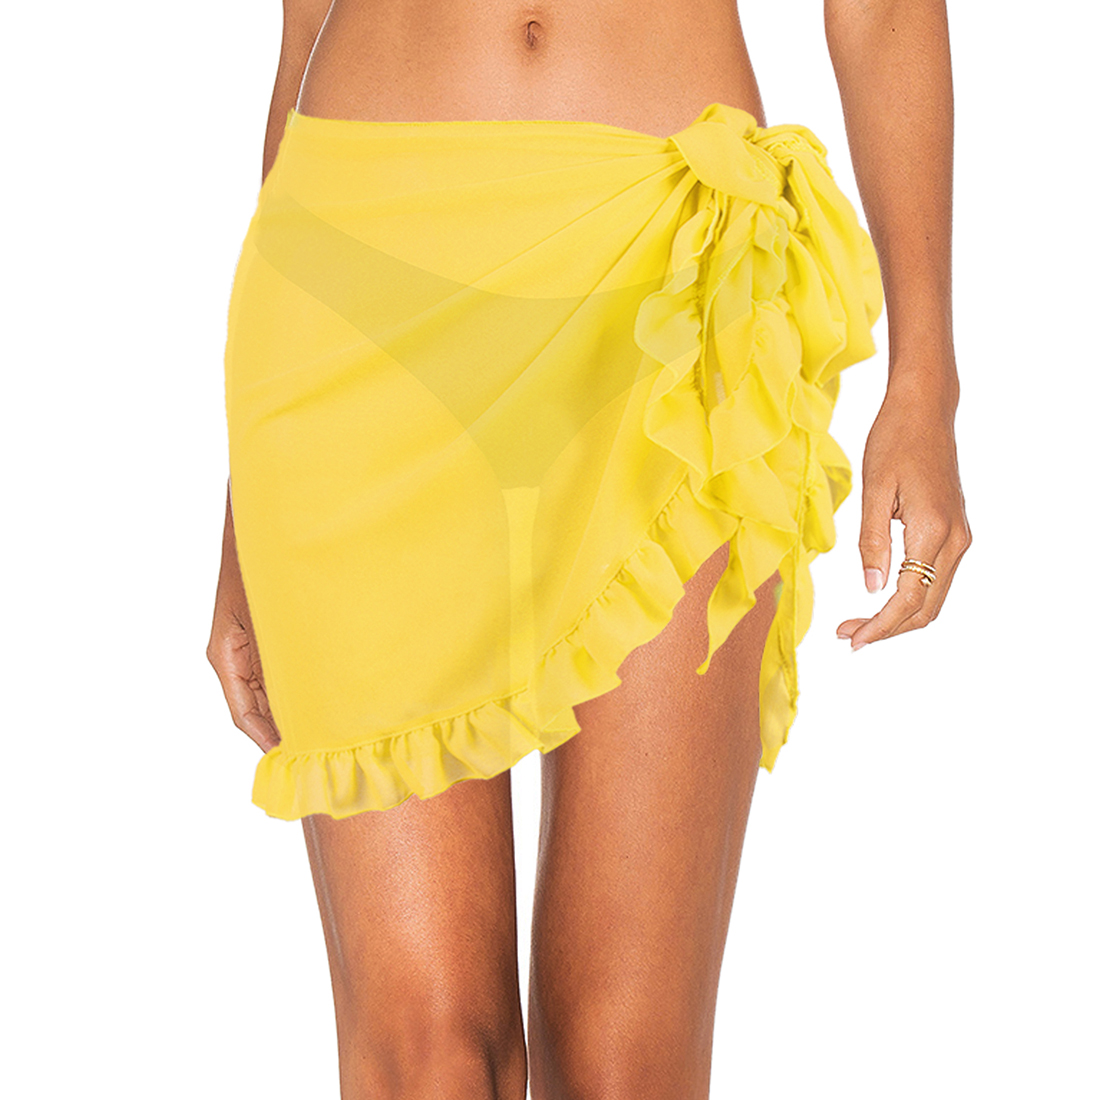 Hawaiian Lavalava Beach Pareo Sarong Polynesian Turtle Print Women Swimsuit Wrap Skirt Beach Sarong Bikini Cover Up for Vacation